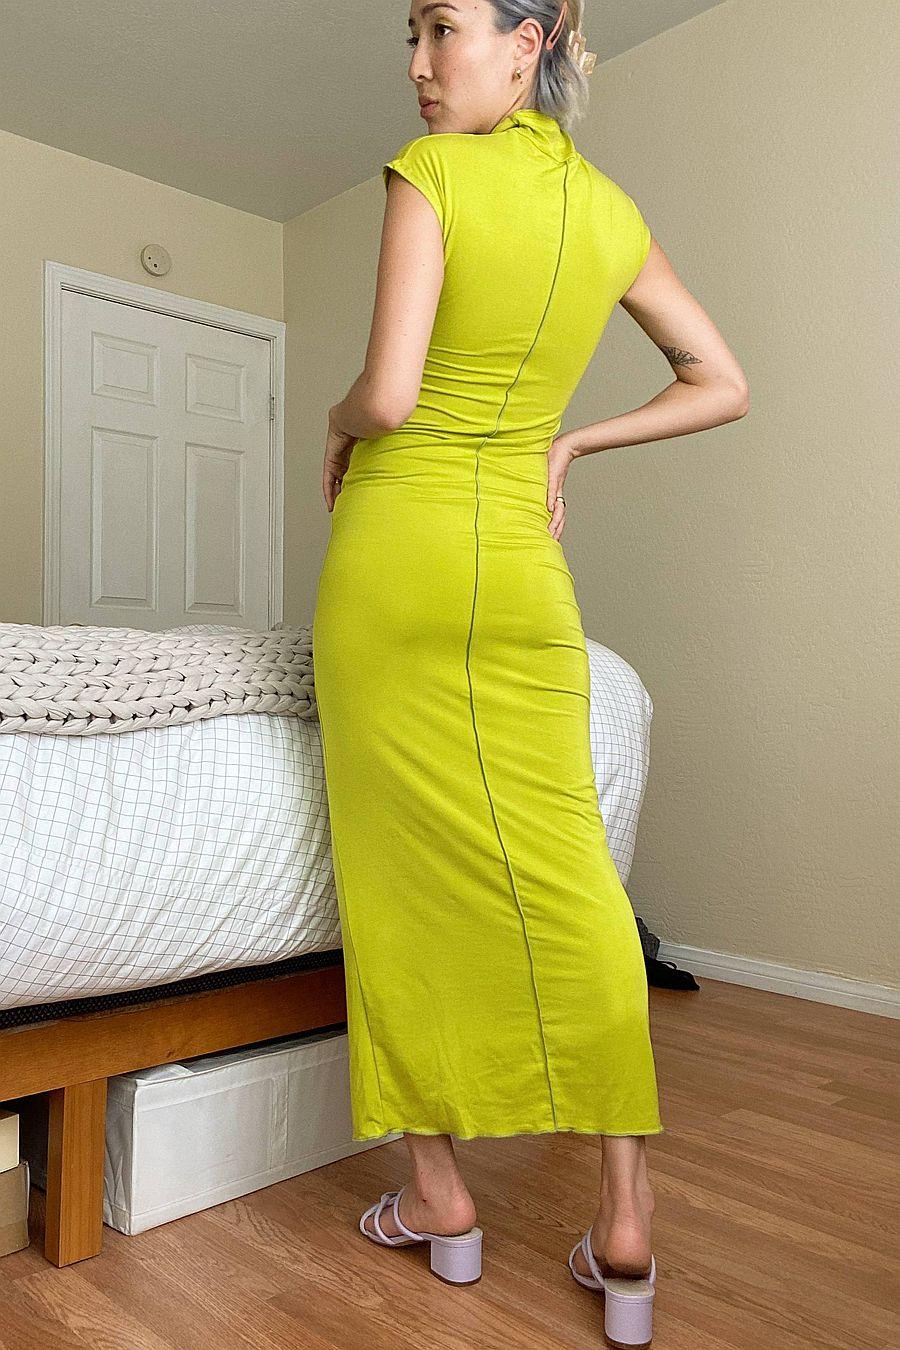 The Line by K Sinea Dress - Chartreuse